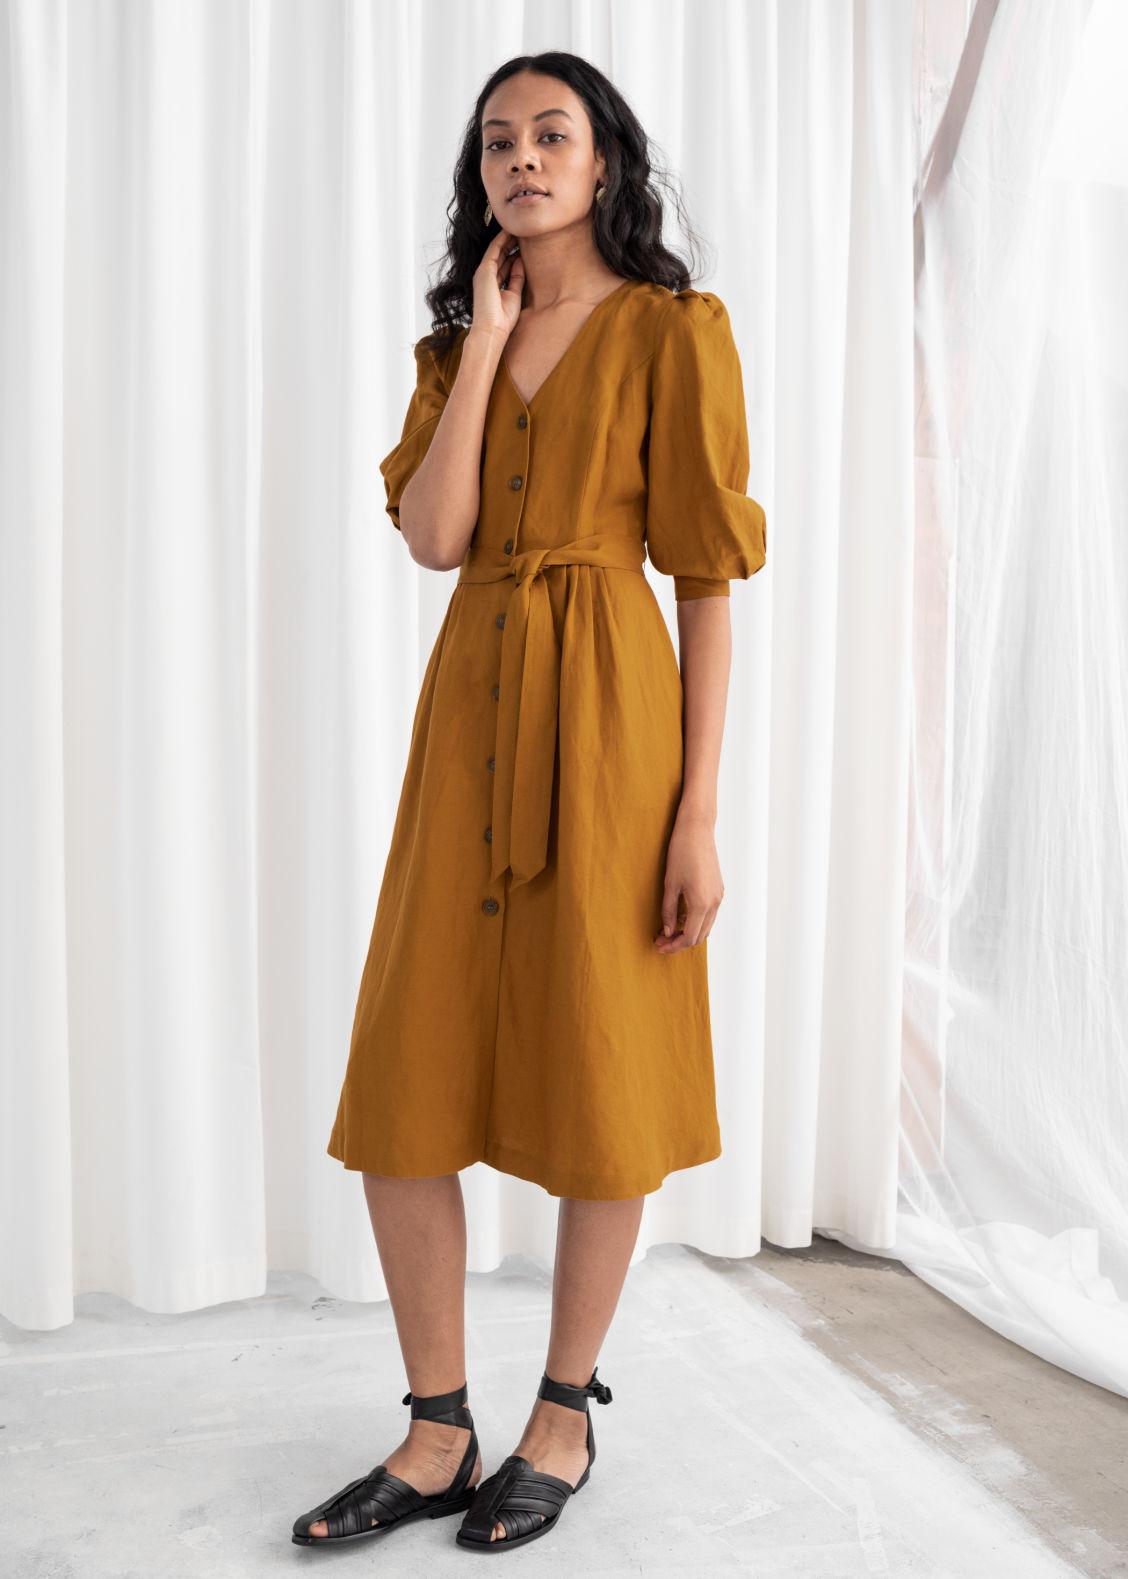 Belted Linen Blend Midi Dress - Mustard - Midi dresses -   Other Stories c4aa5d0ad